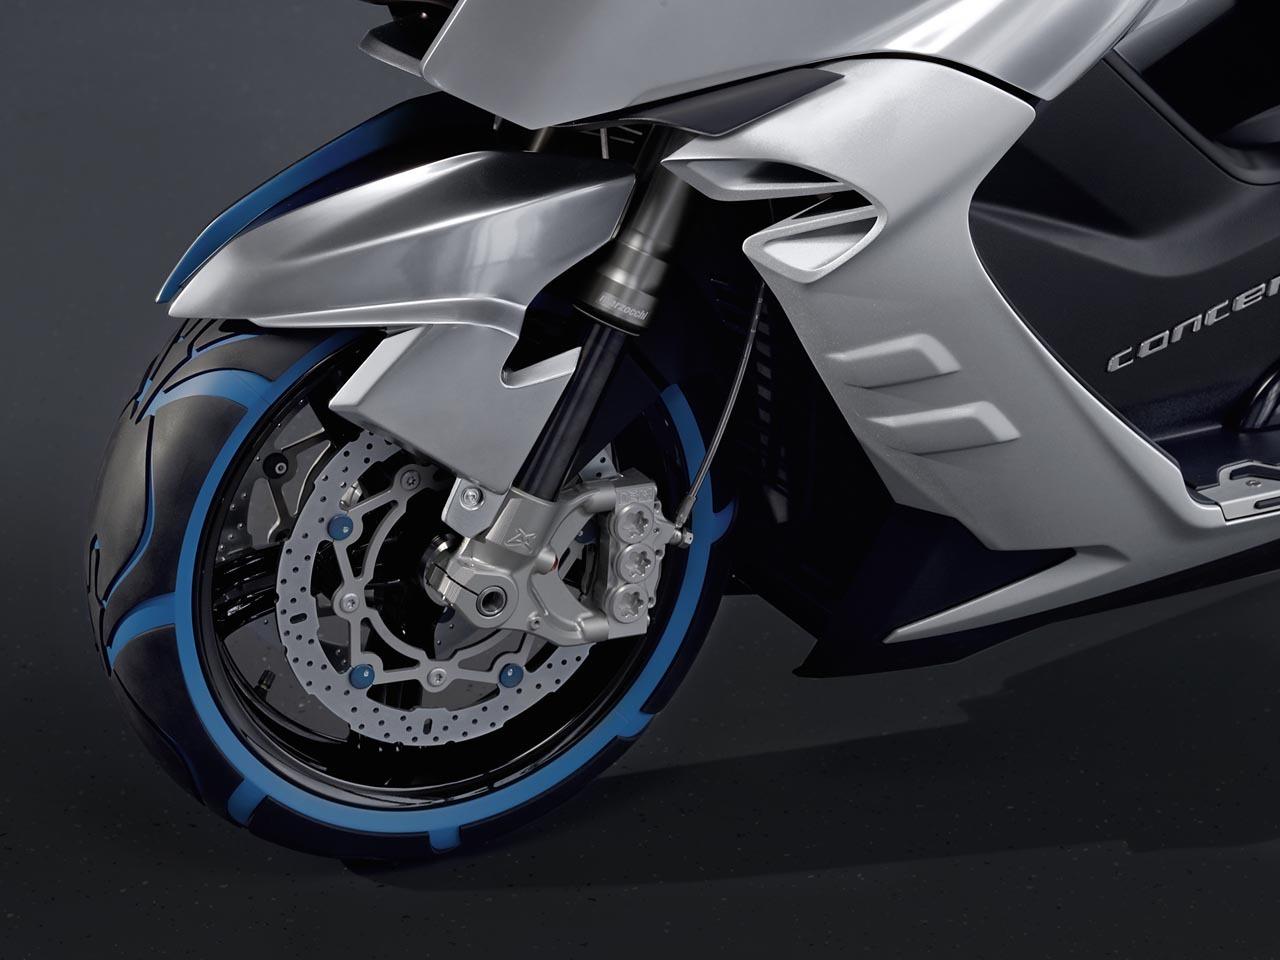 Foto de BMW Concept C Scooter, el Scooter del futuro según BMW (15/19)